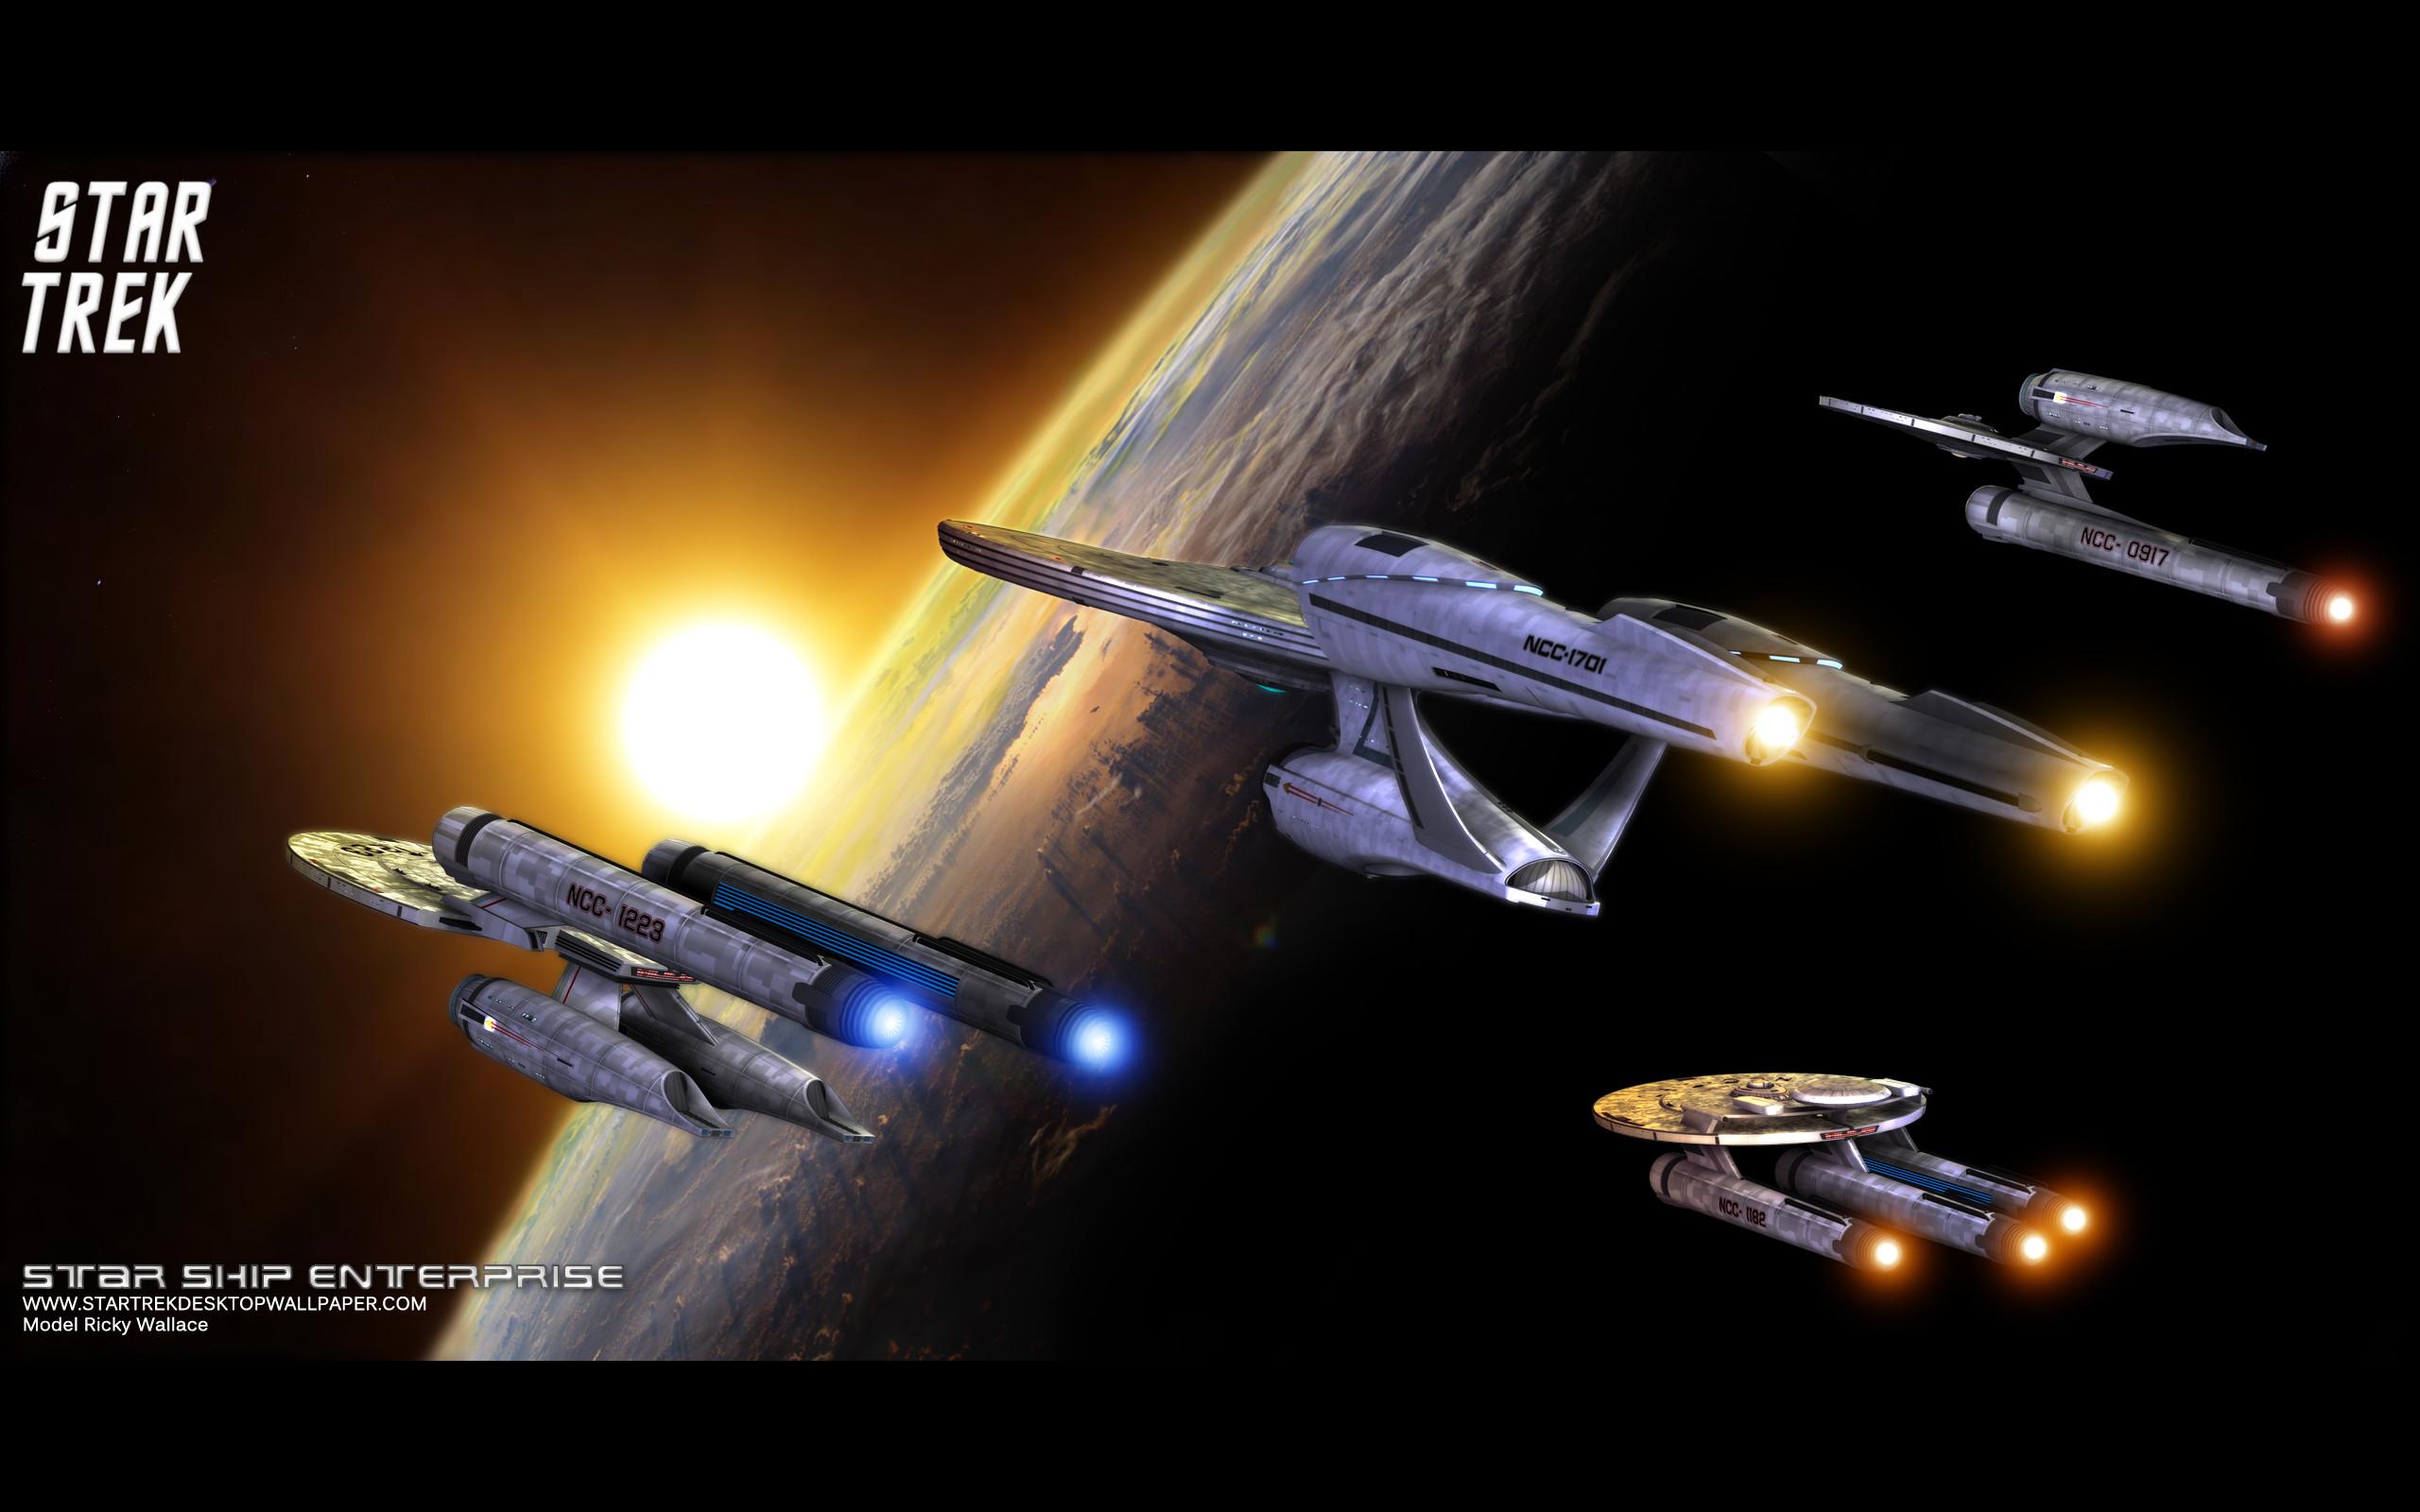 Star Trek Star Ship Enterprise – free Star Trek computer desktop wallpaper,  pictures,